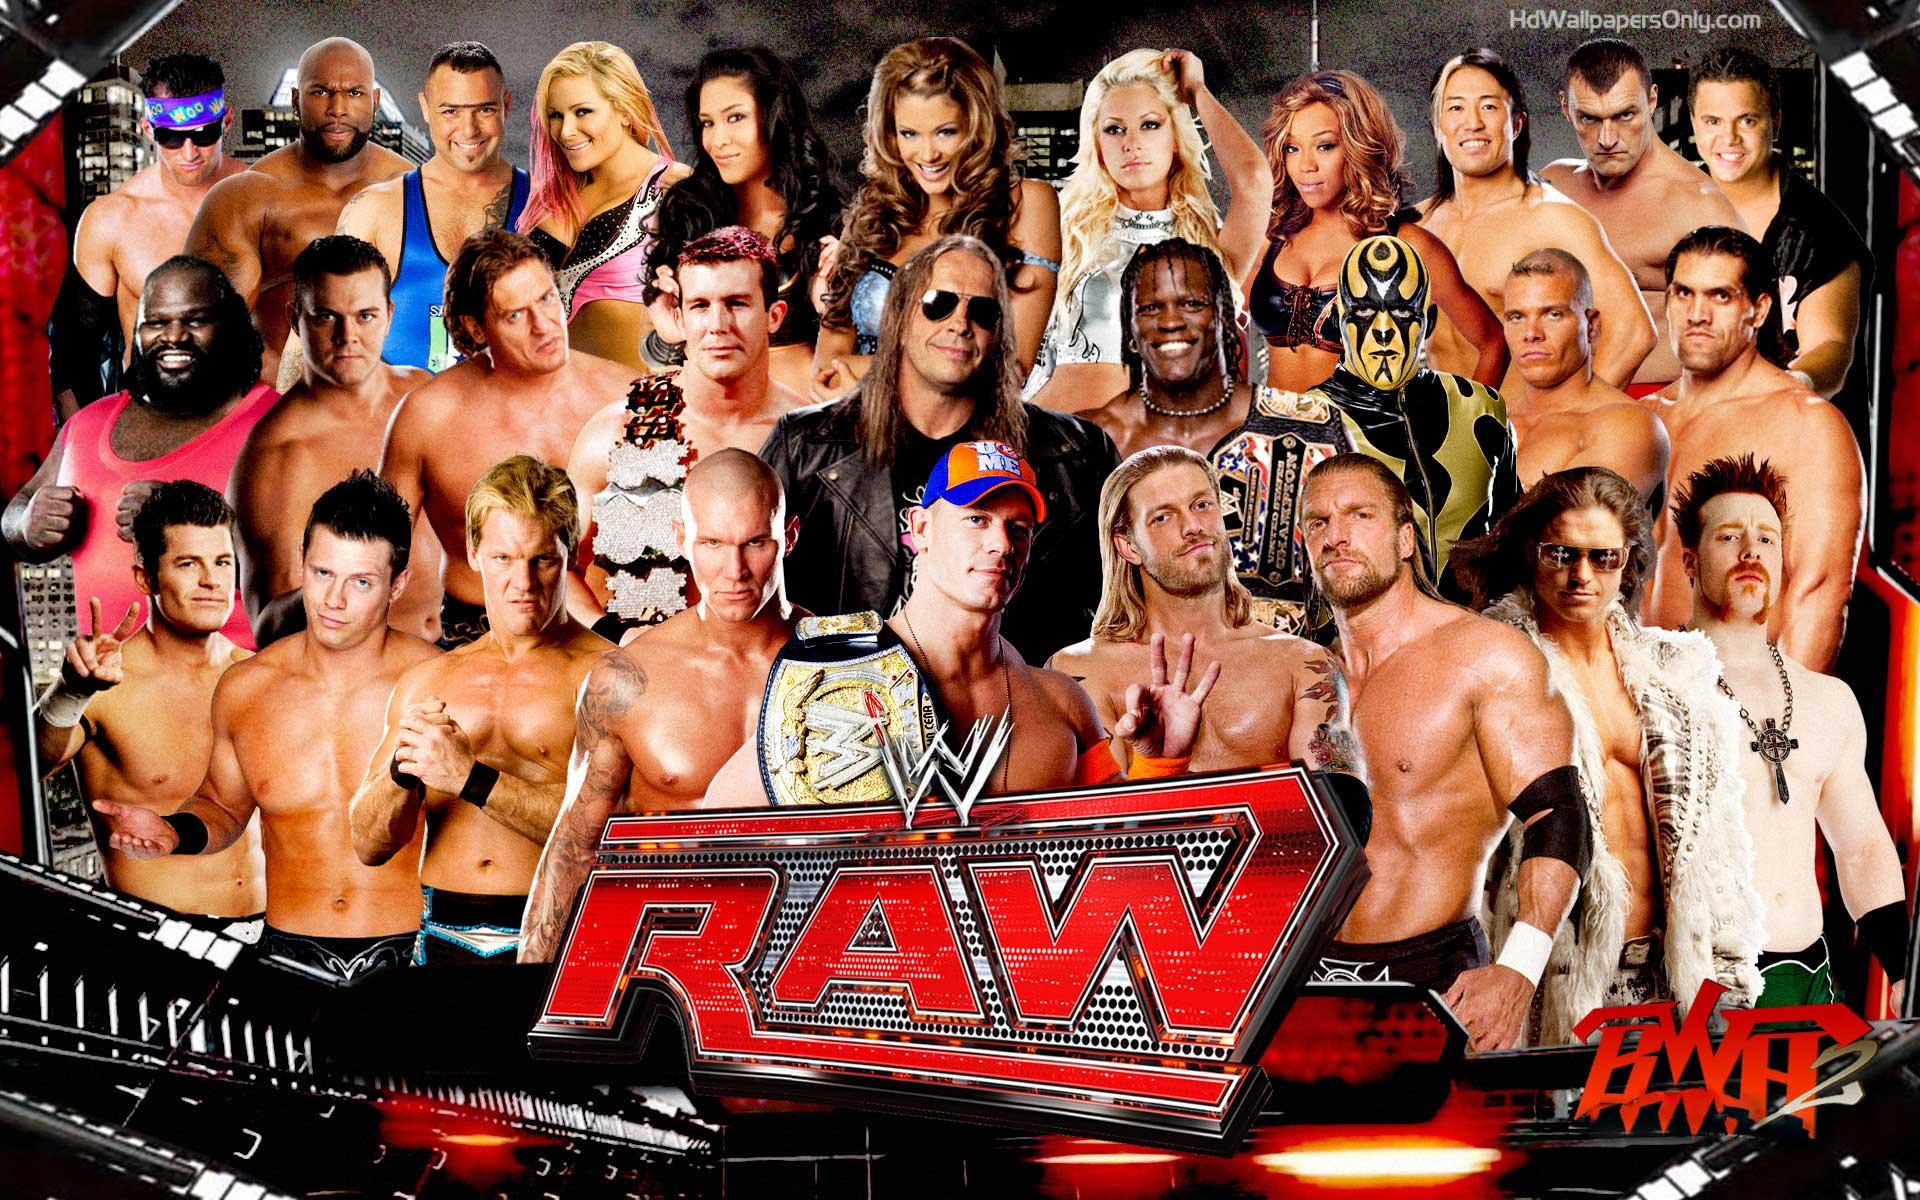 Stunning WWE Wallpaper